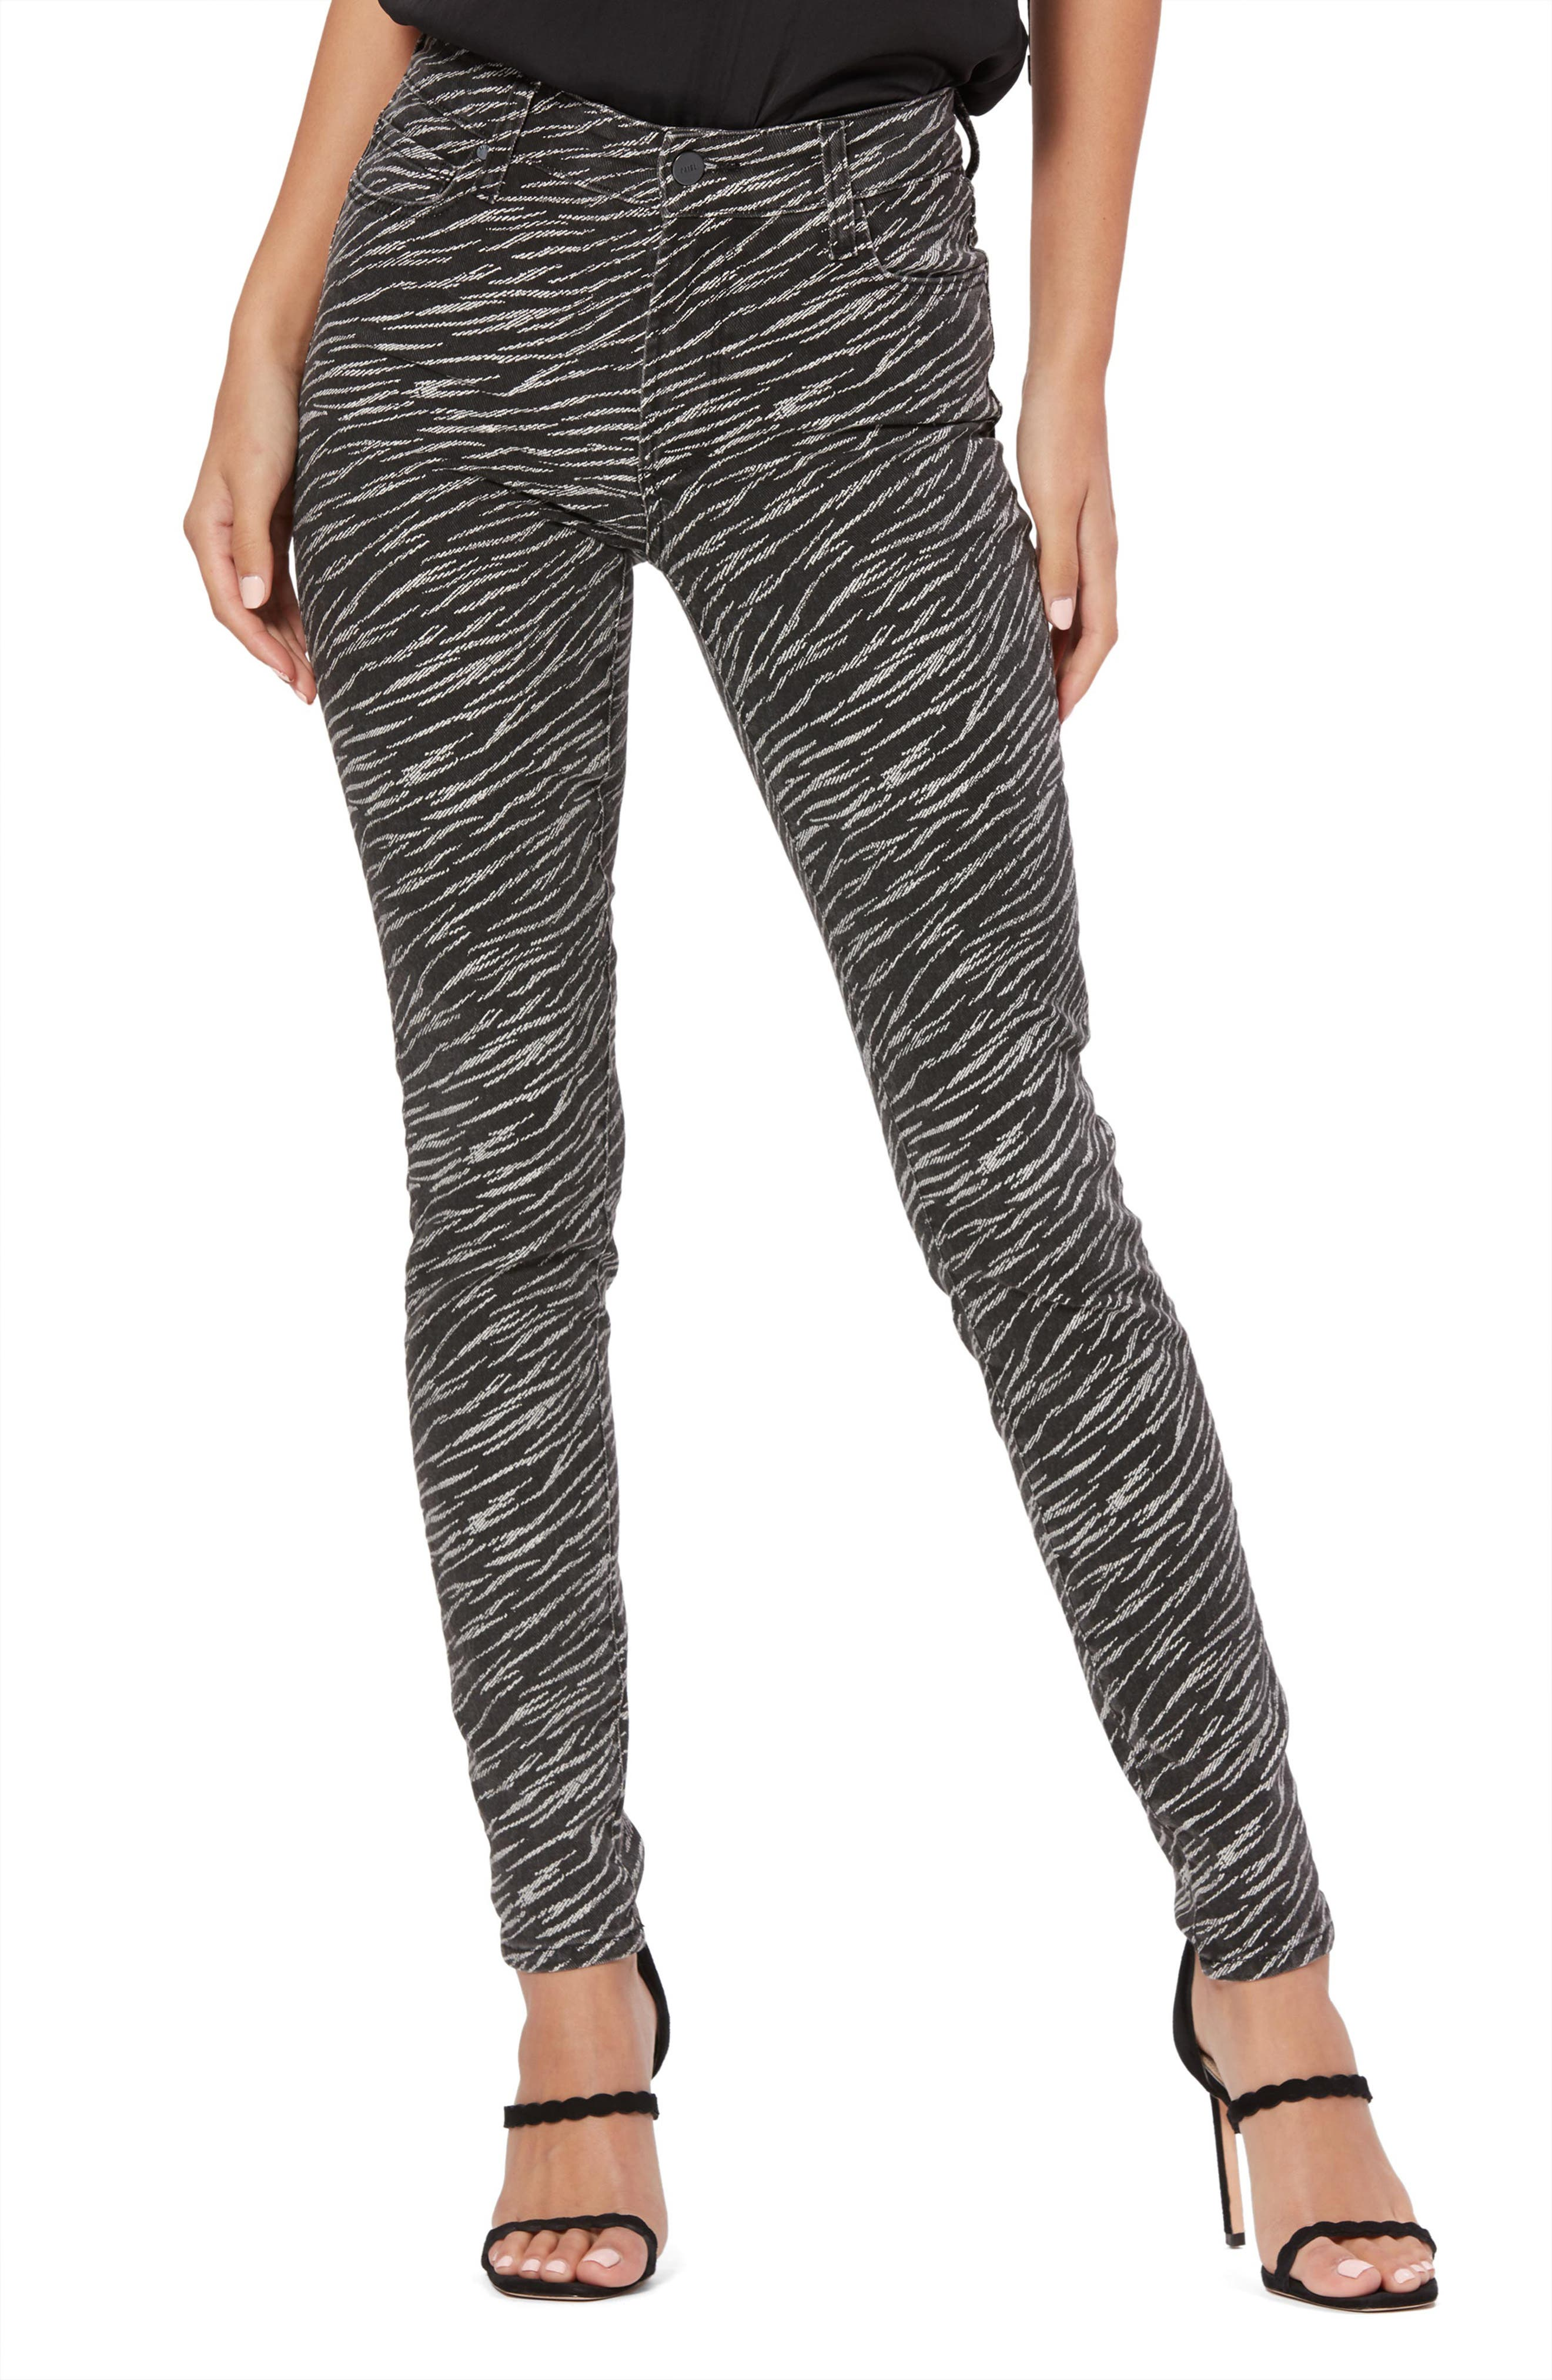 Image of PAIGE Hoxton Zebra Stripe High Waist Ultra Skinny Jeans